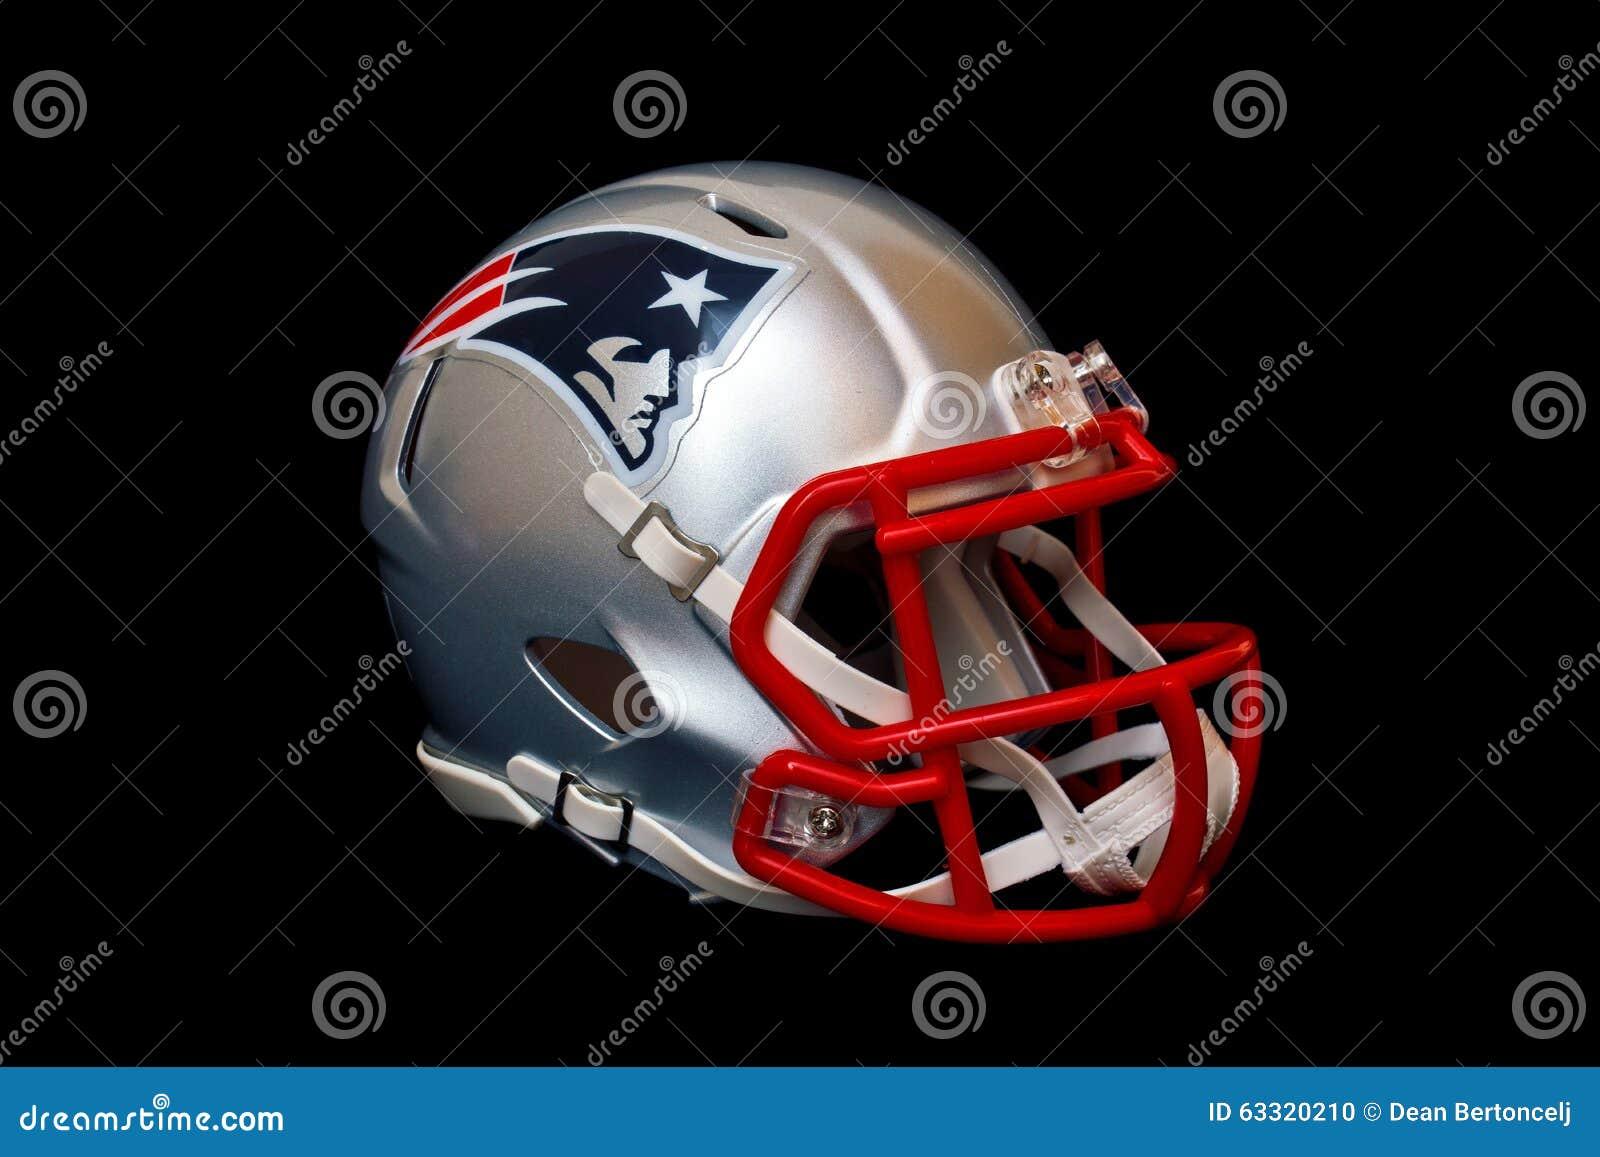 New England Patriots Helmet Editorial Image - Image: 63320210